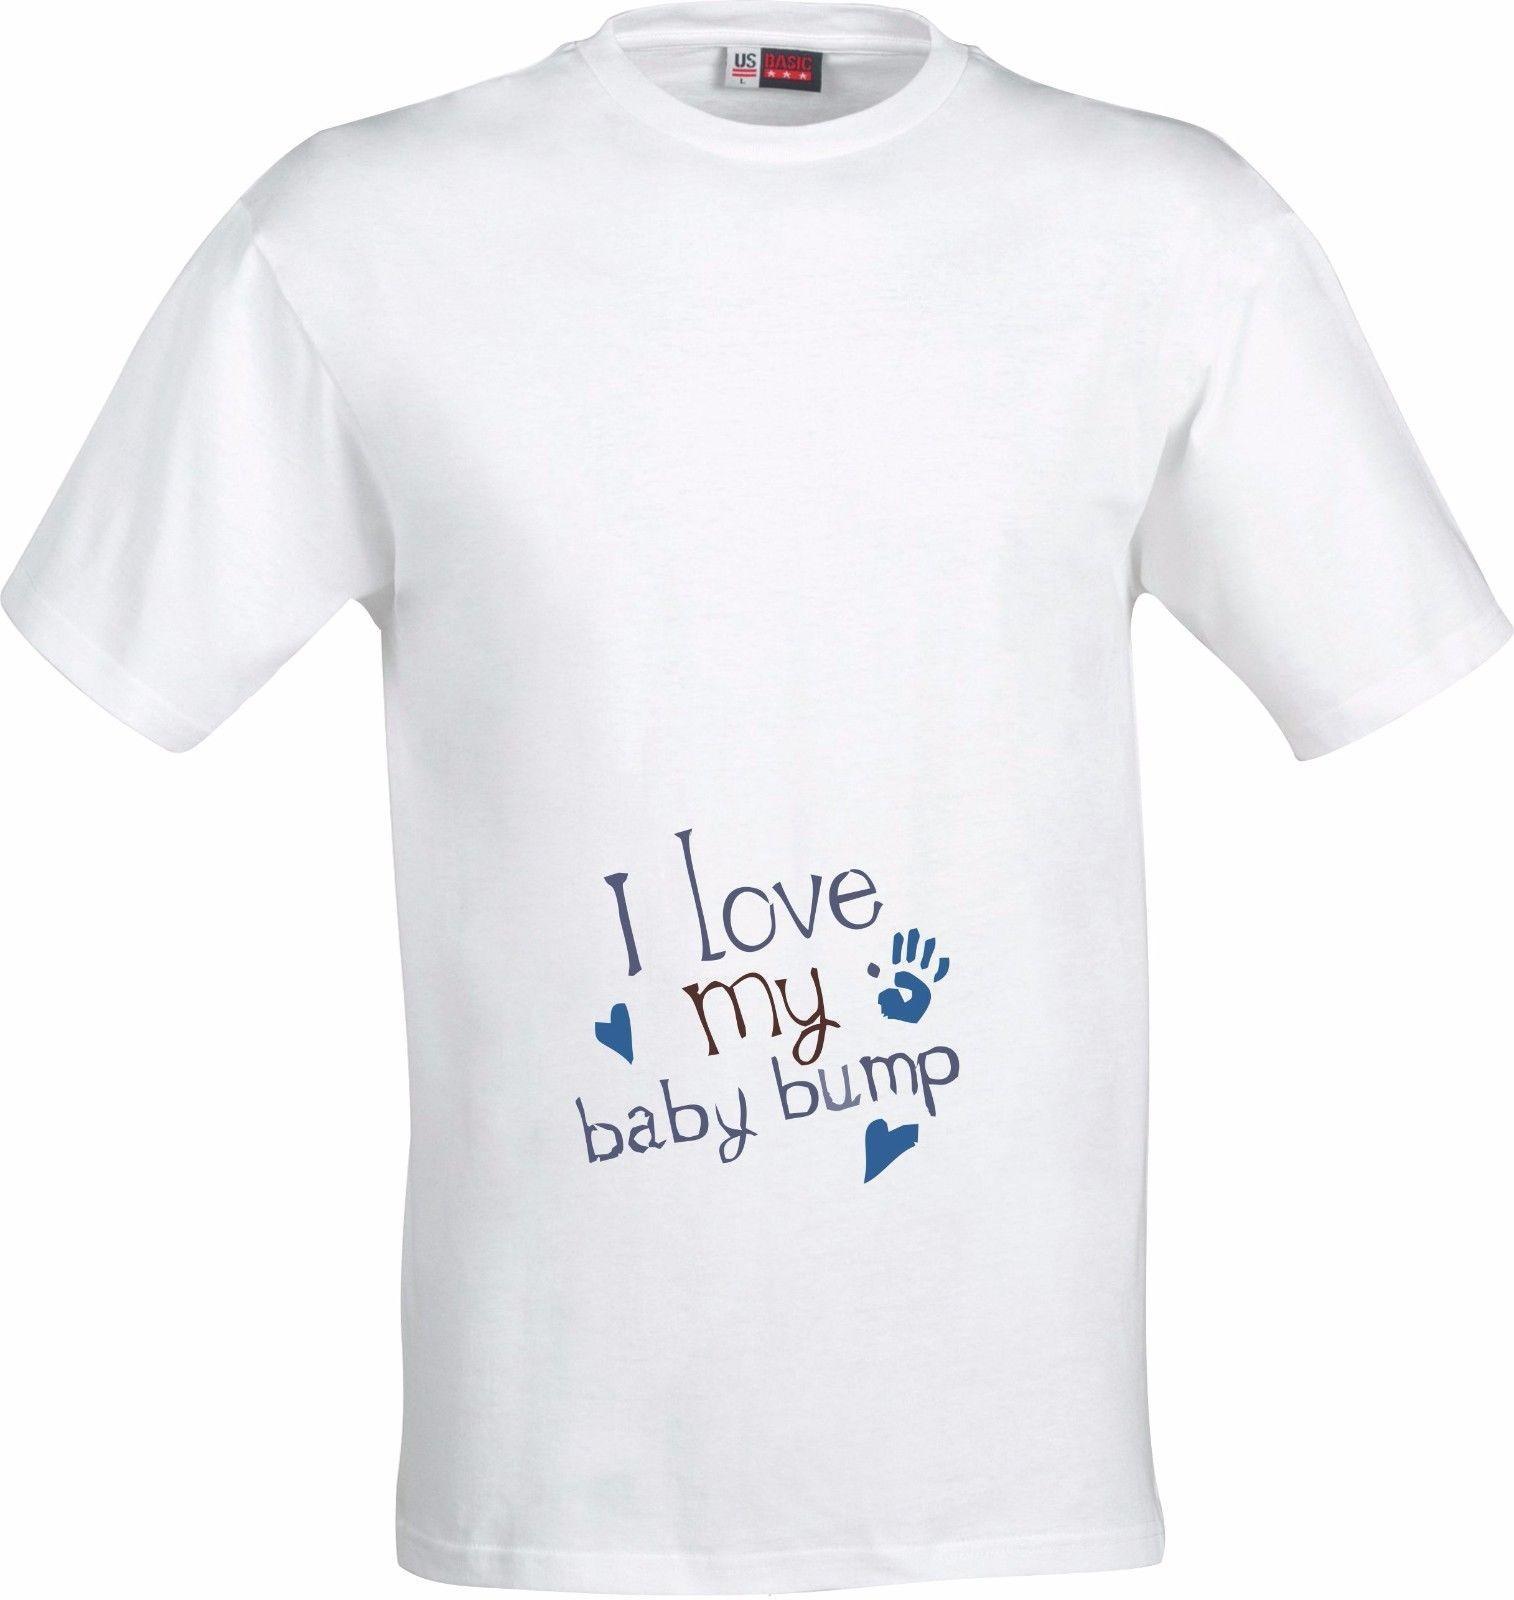 e90b82161 I LOVE MY BABY BUMP PREGNANCY MATERNITY GIFT FULL COLOR SUBLIMATION T SHIRT  Custom Printed Tshirt, Hip Hop Funny Tee, Mens Tee Shirts Design Shirt  Formal ...